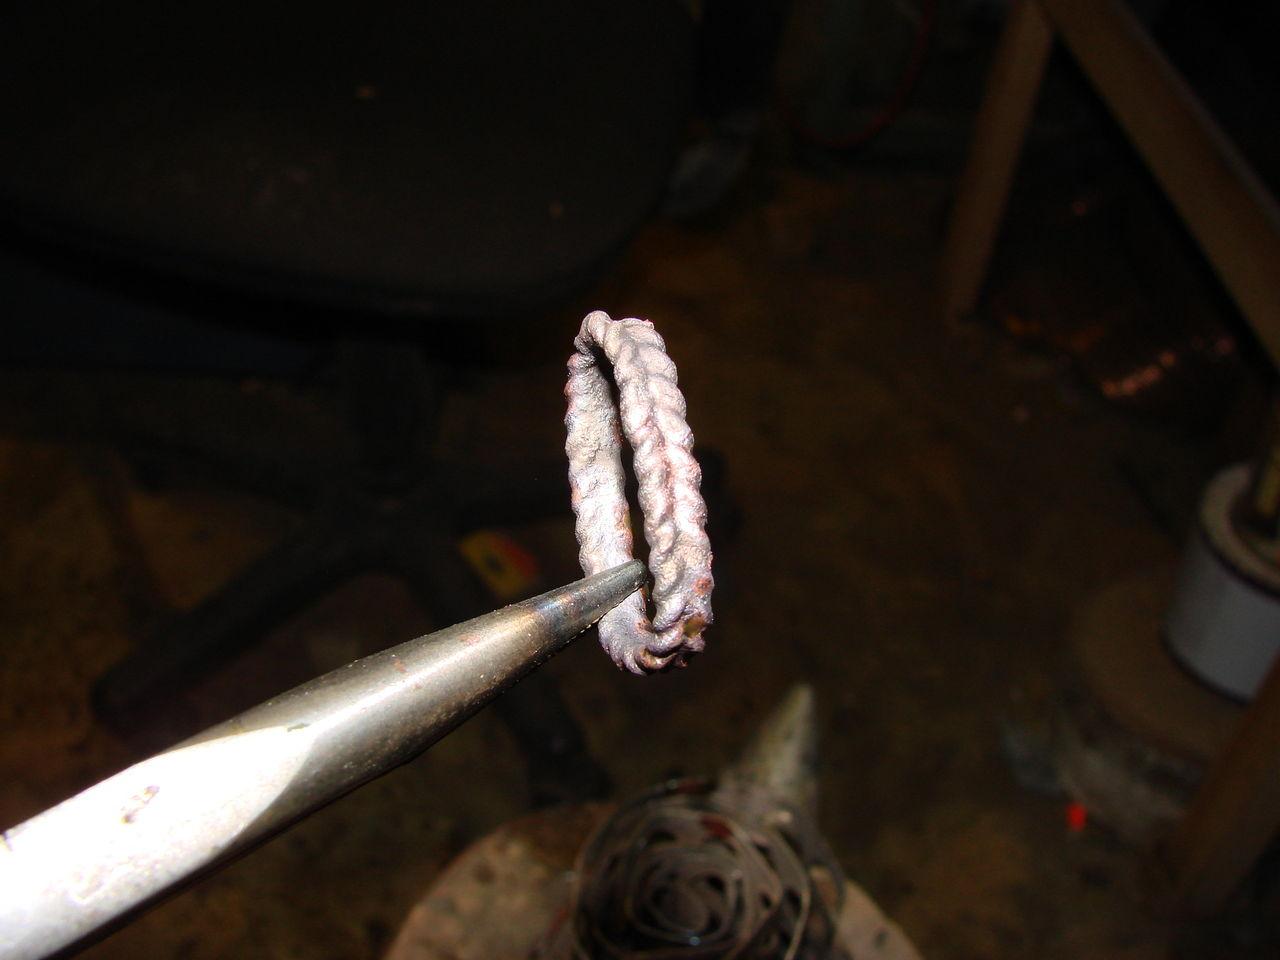 Как запаять серебро в домашних условиях